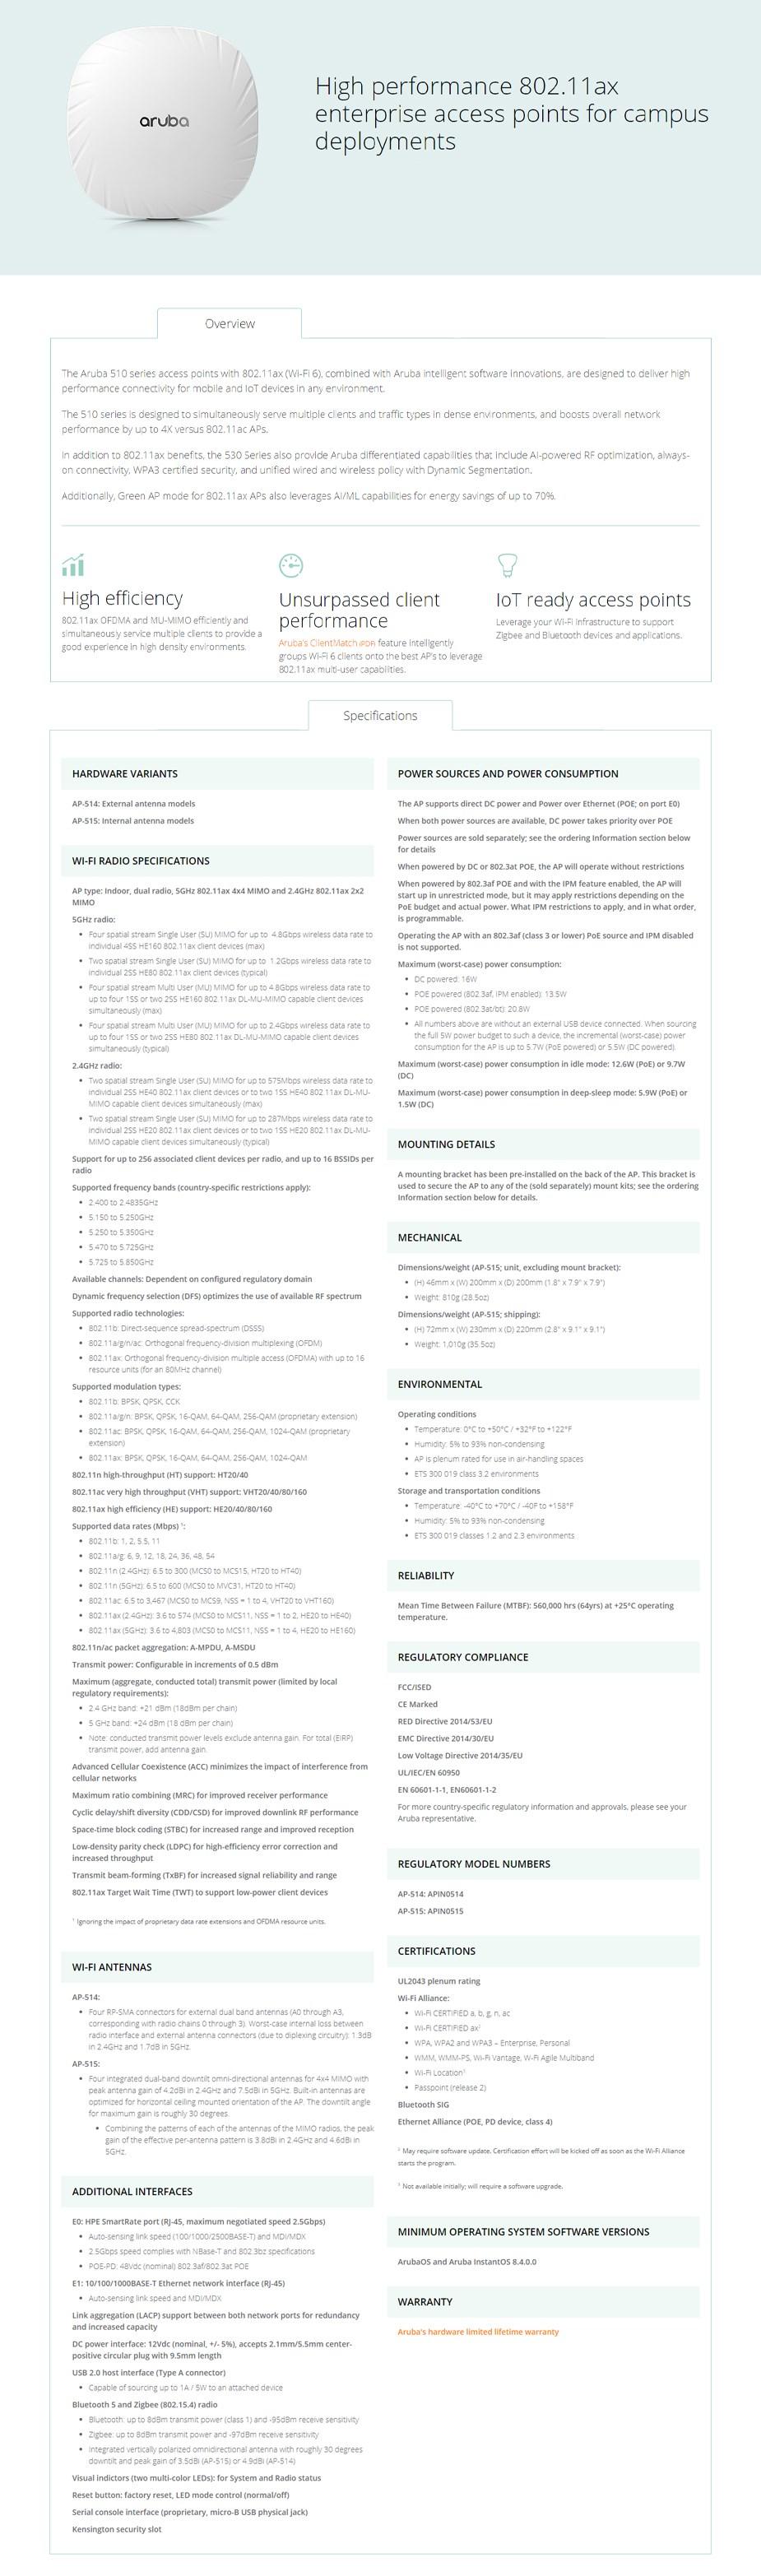 HPE Aruba AP-514 802.11ax Dual-Radio 4x4 MU-MIMO Indoor Access Point - Overview 1